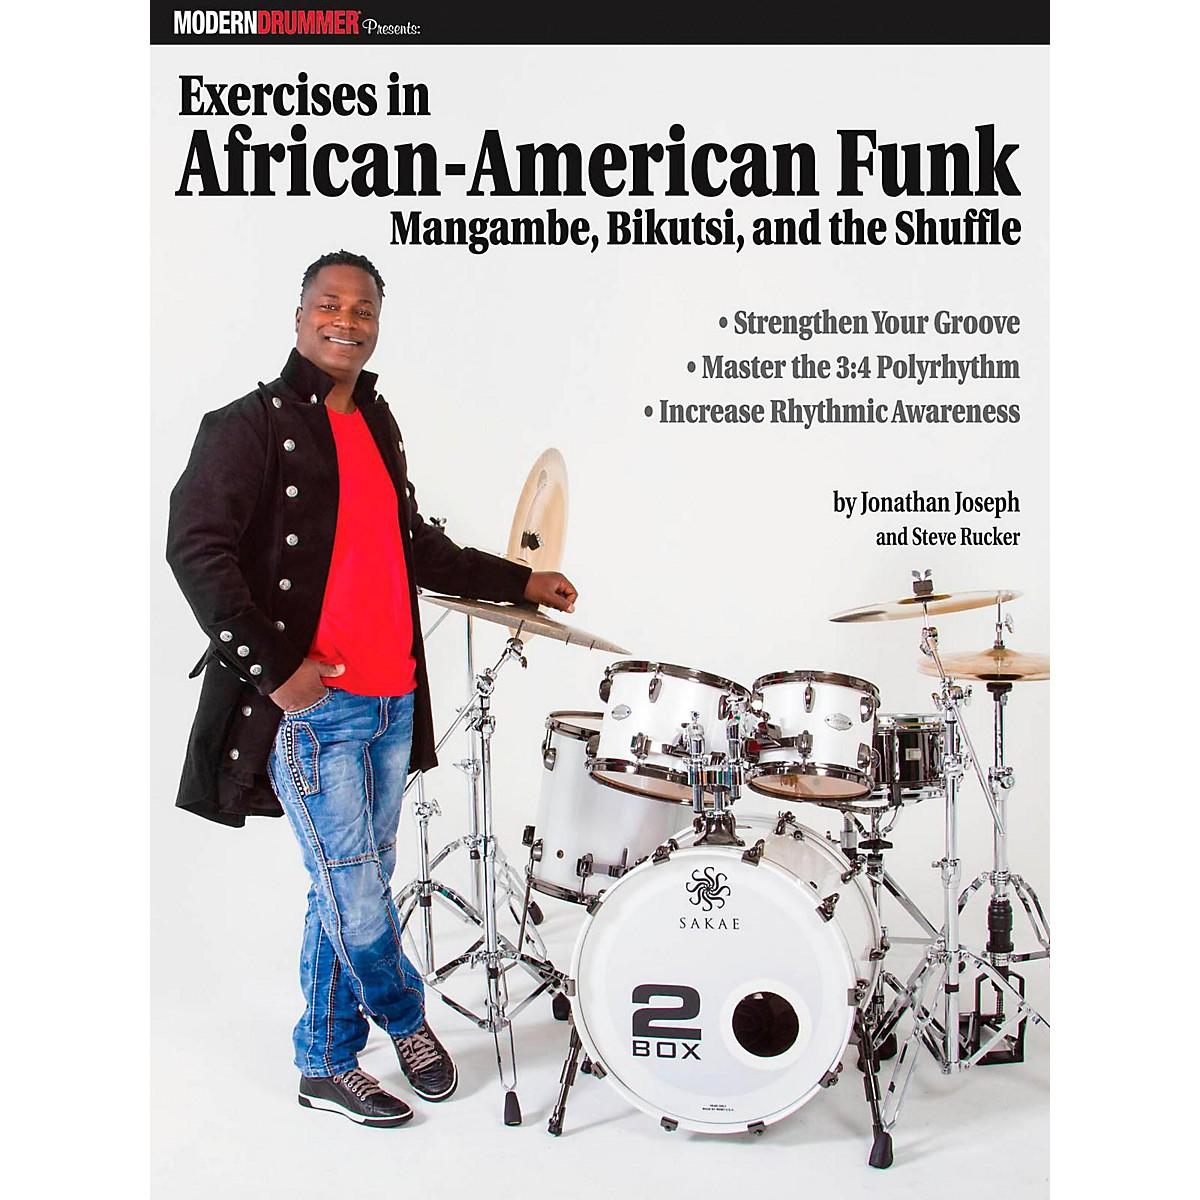 Modern Drummer Modern Drummer Exercises In African-American Funk Mangambe, Bikutsi and The Shuffle